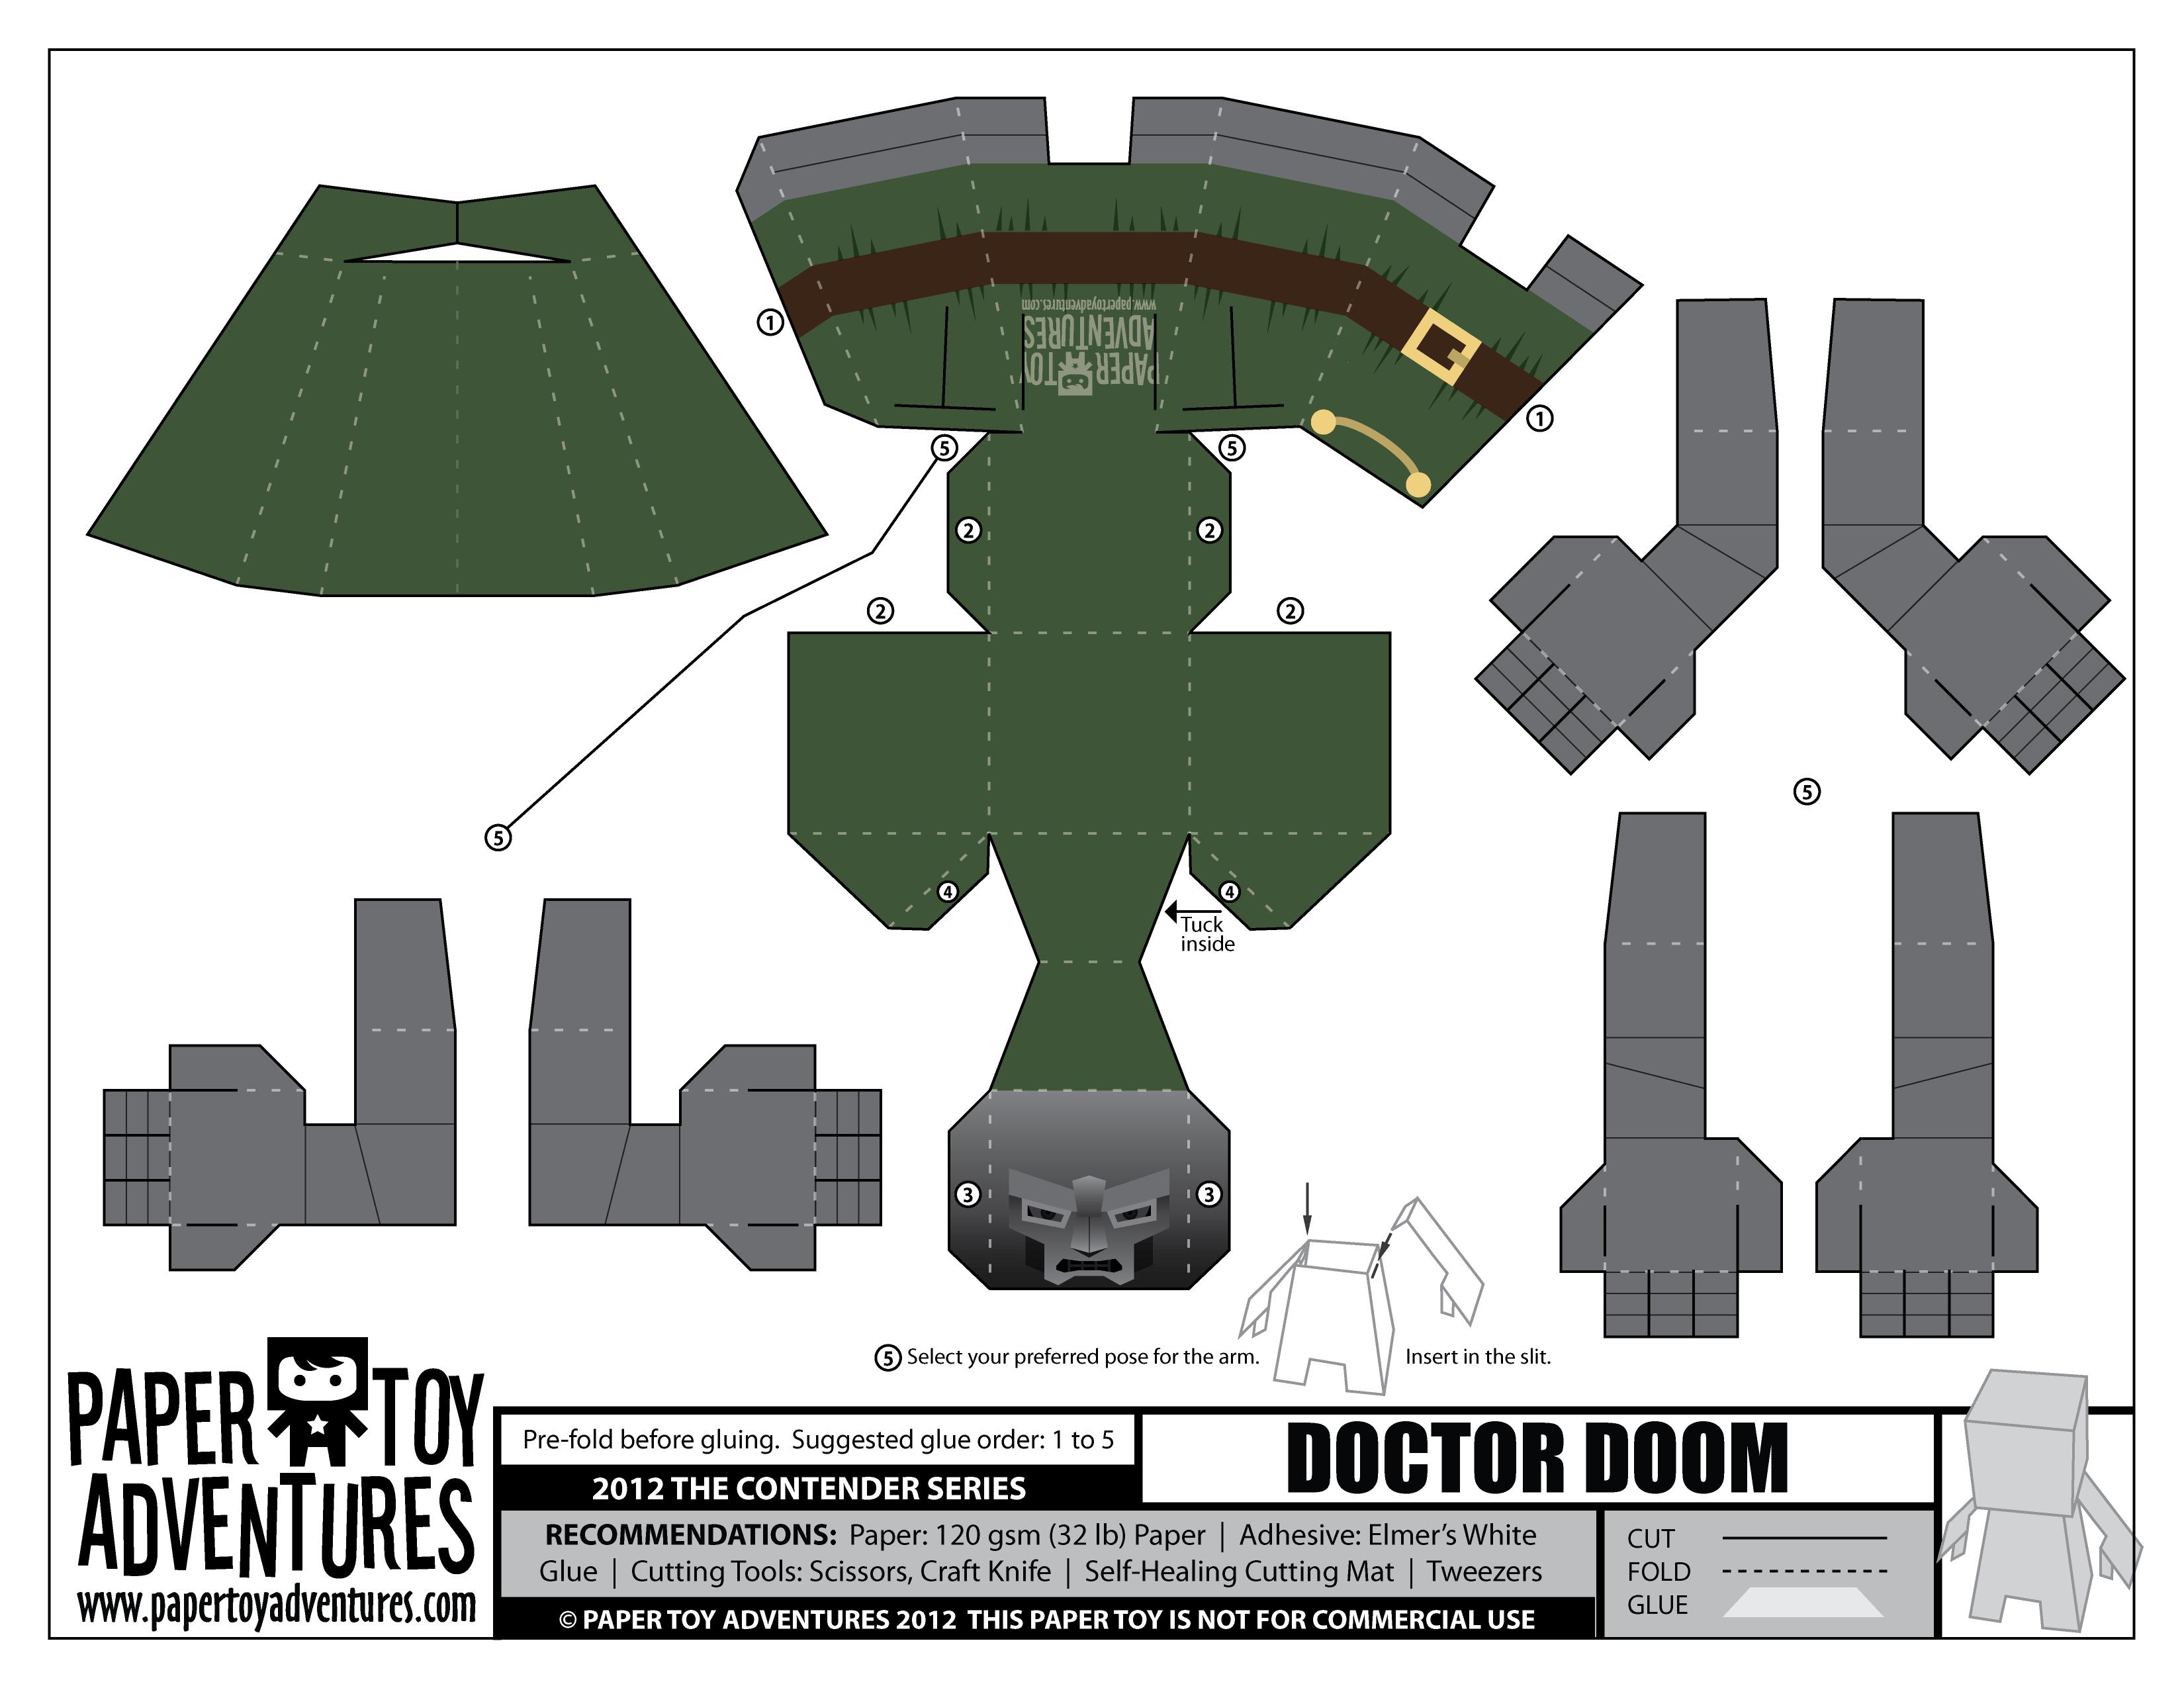 Dr Doom Papercraft Template  Papercrafts